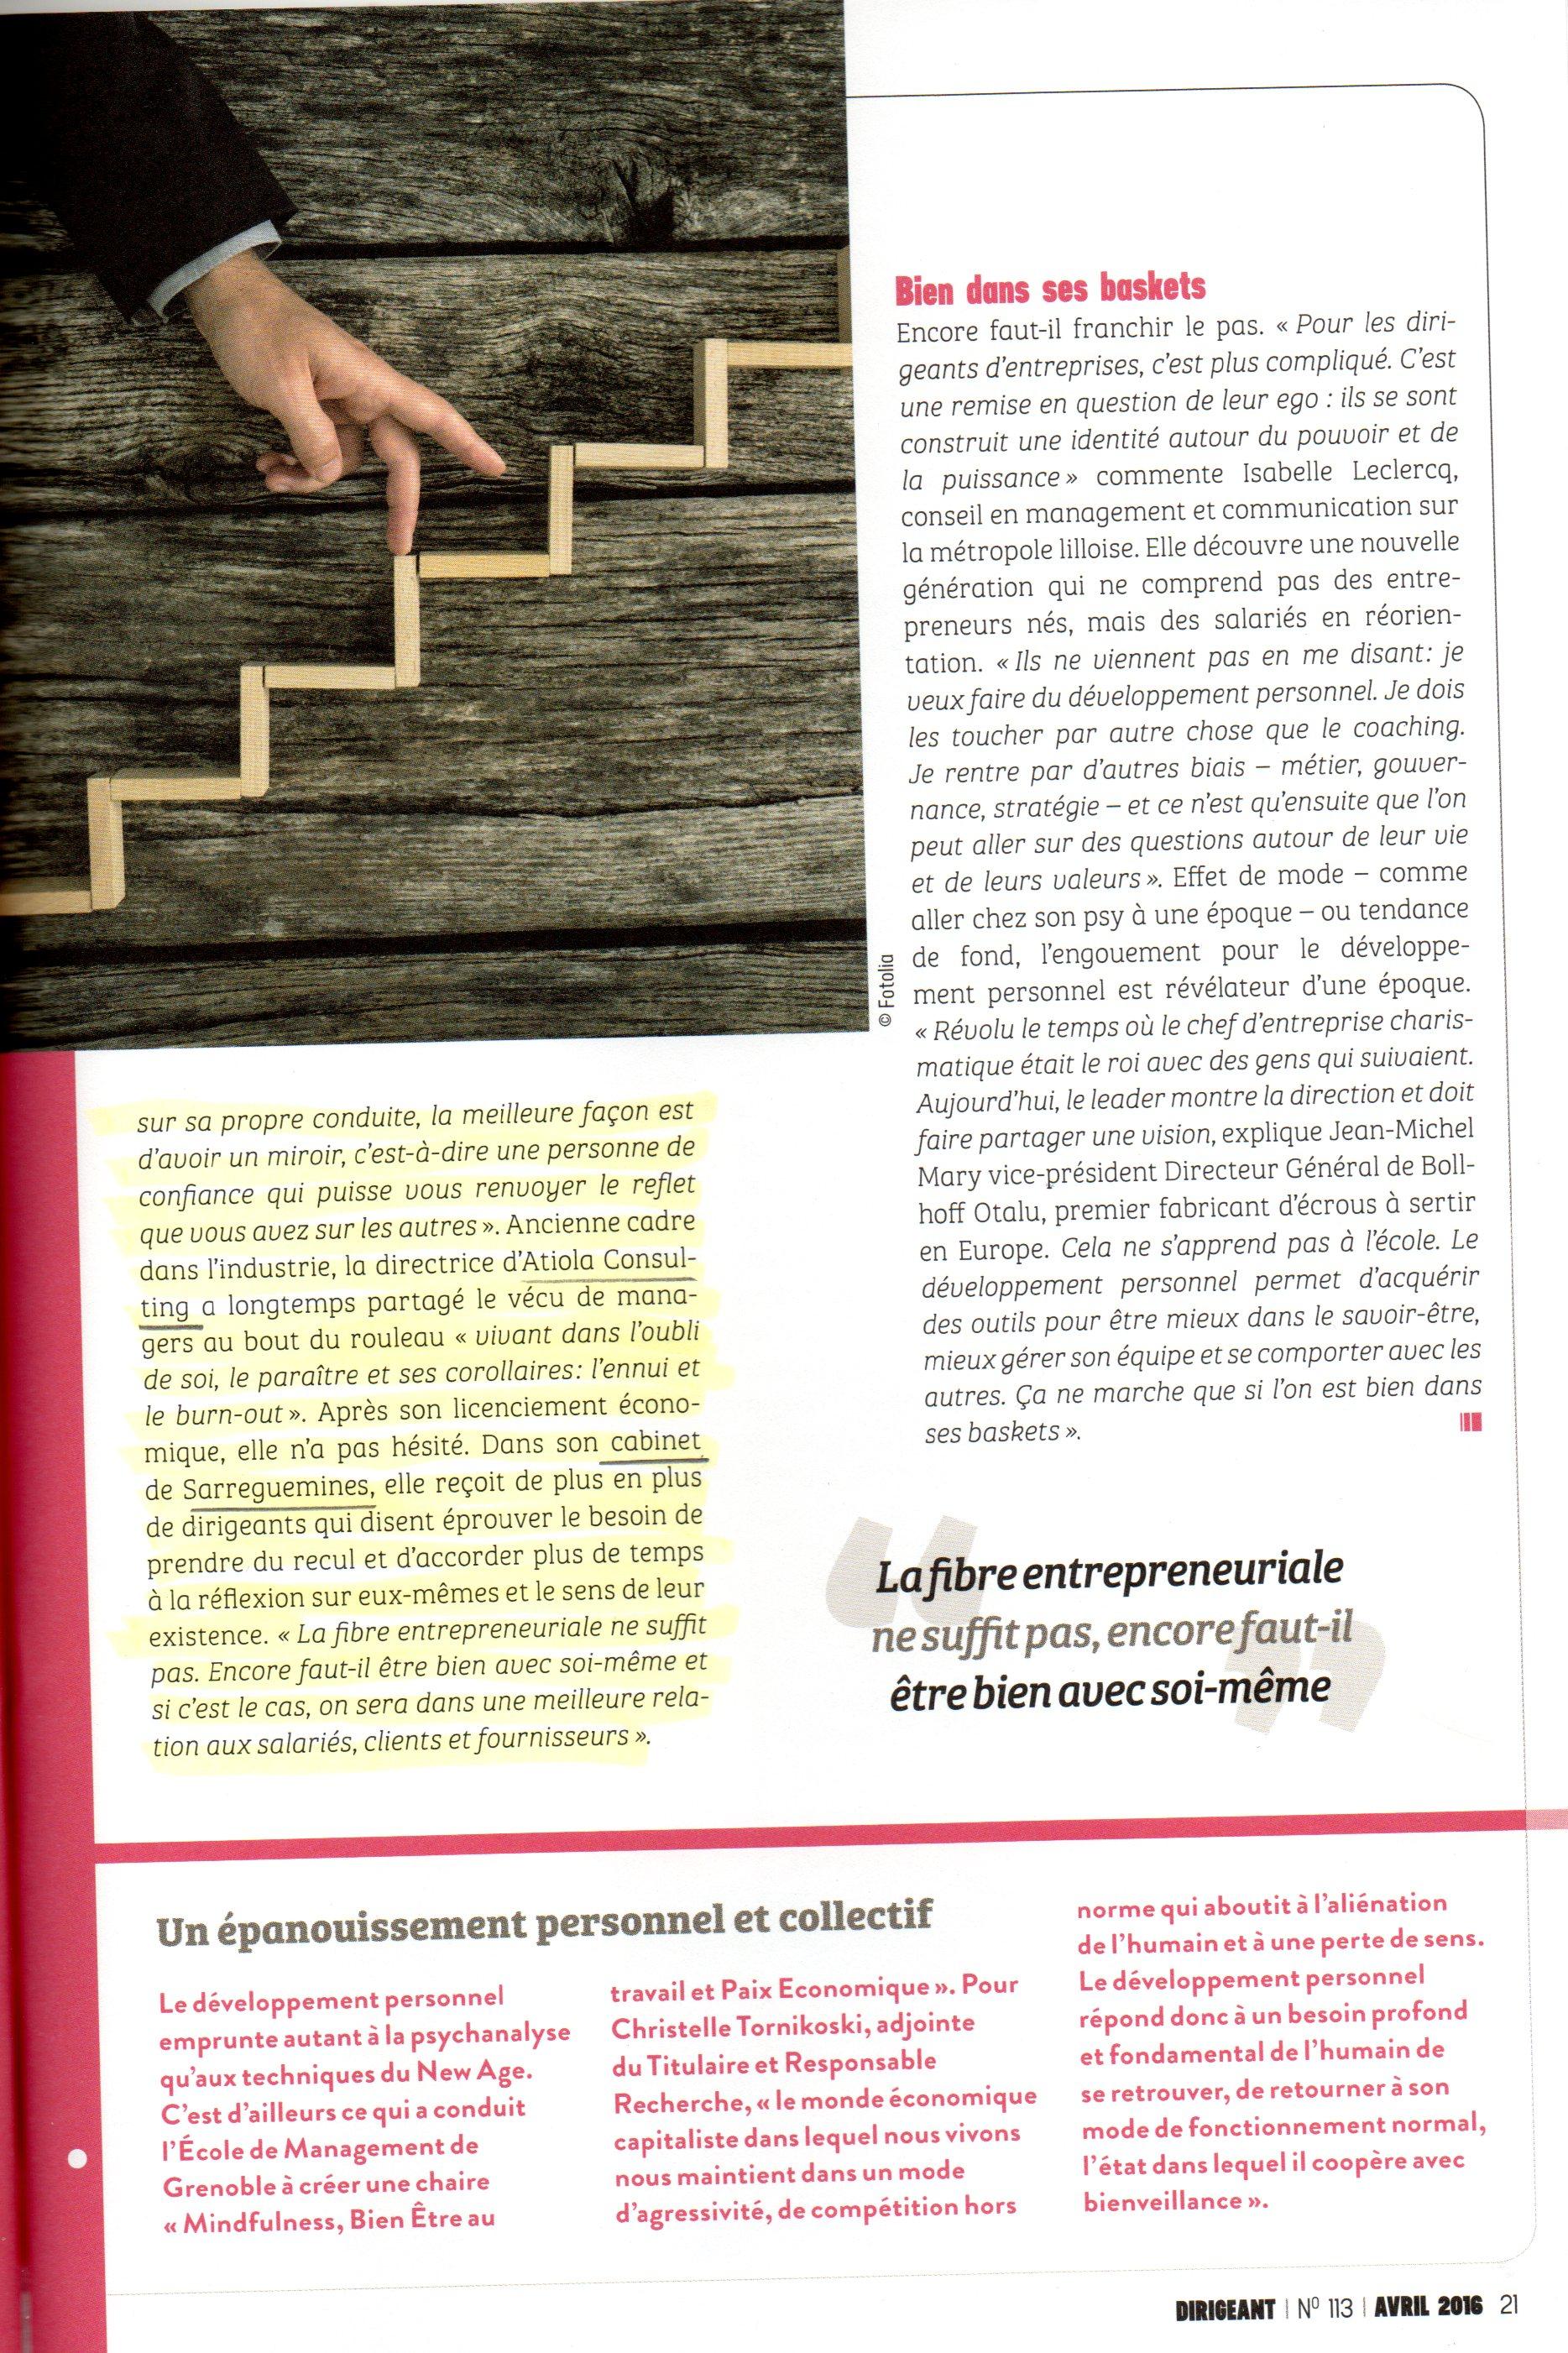 DIRIGEANT article003